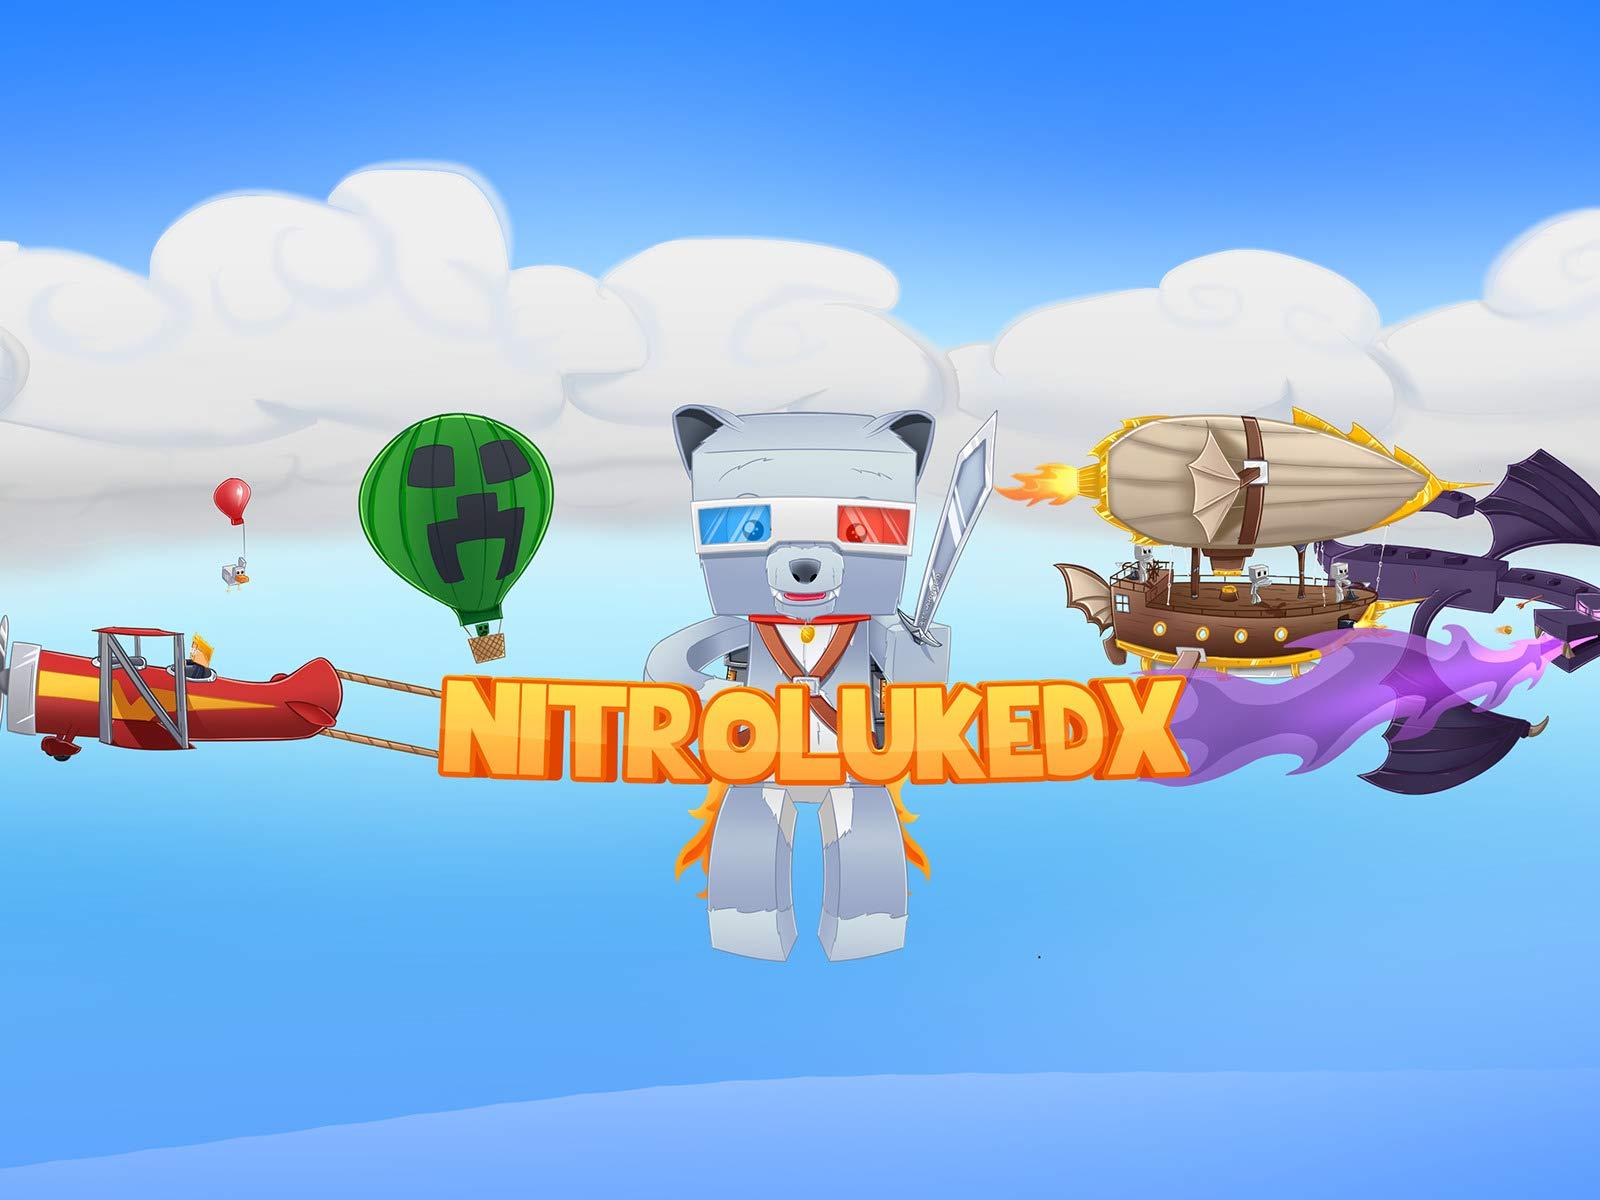 Amazon com: Watch NitroLukeDX | Prime Video